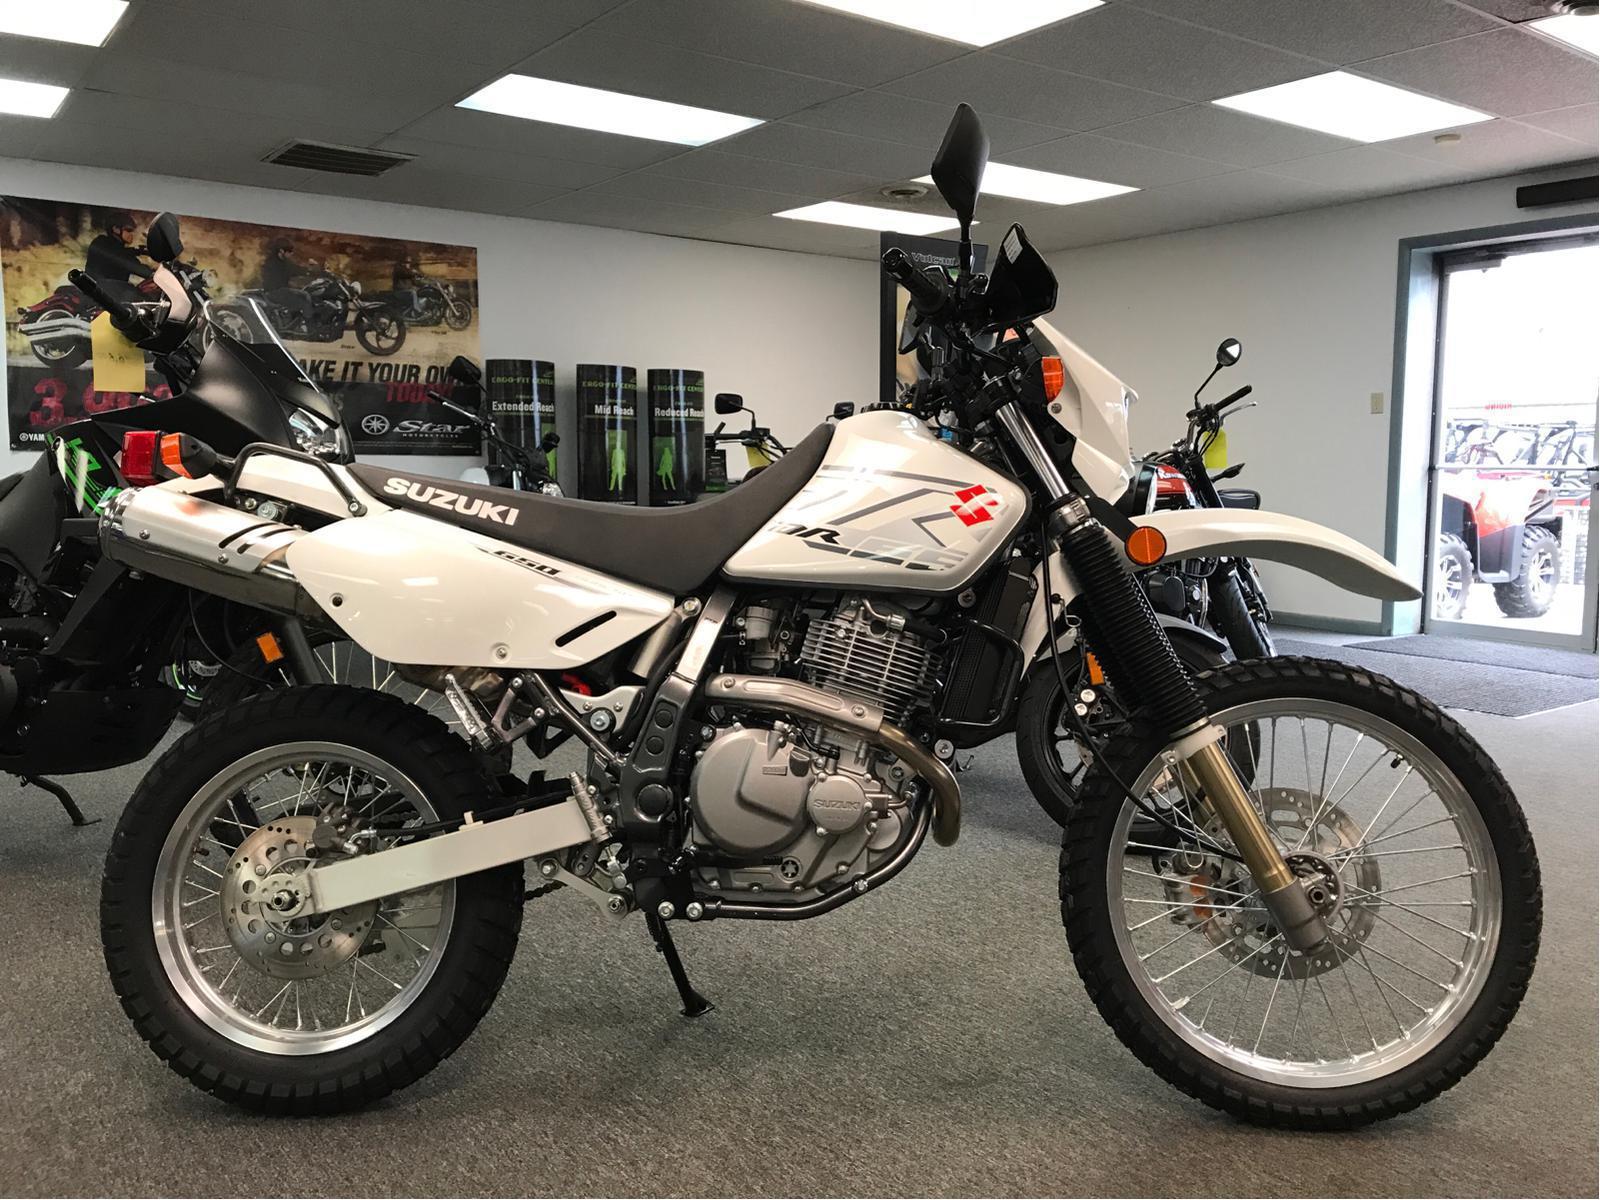 Inventory From Suzuki Sportland Motorsports Urbana Il 217 328 5005 Lincoln Pit Bike 2018 Dr650s